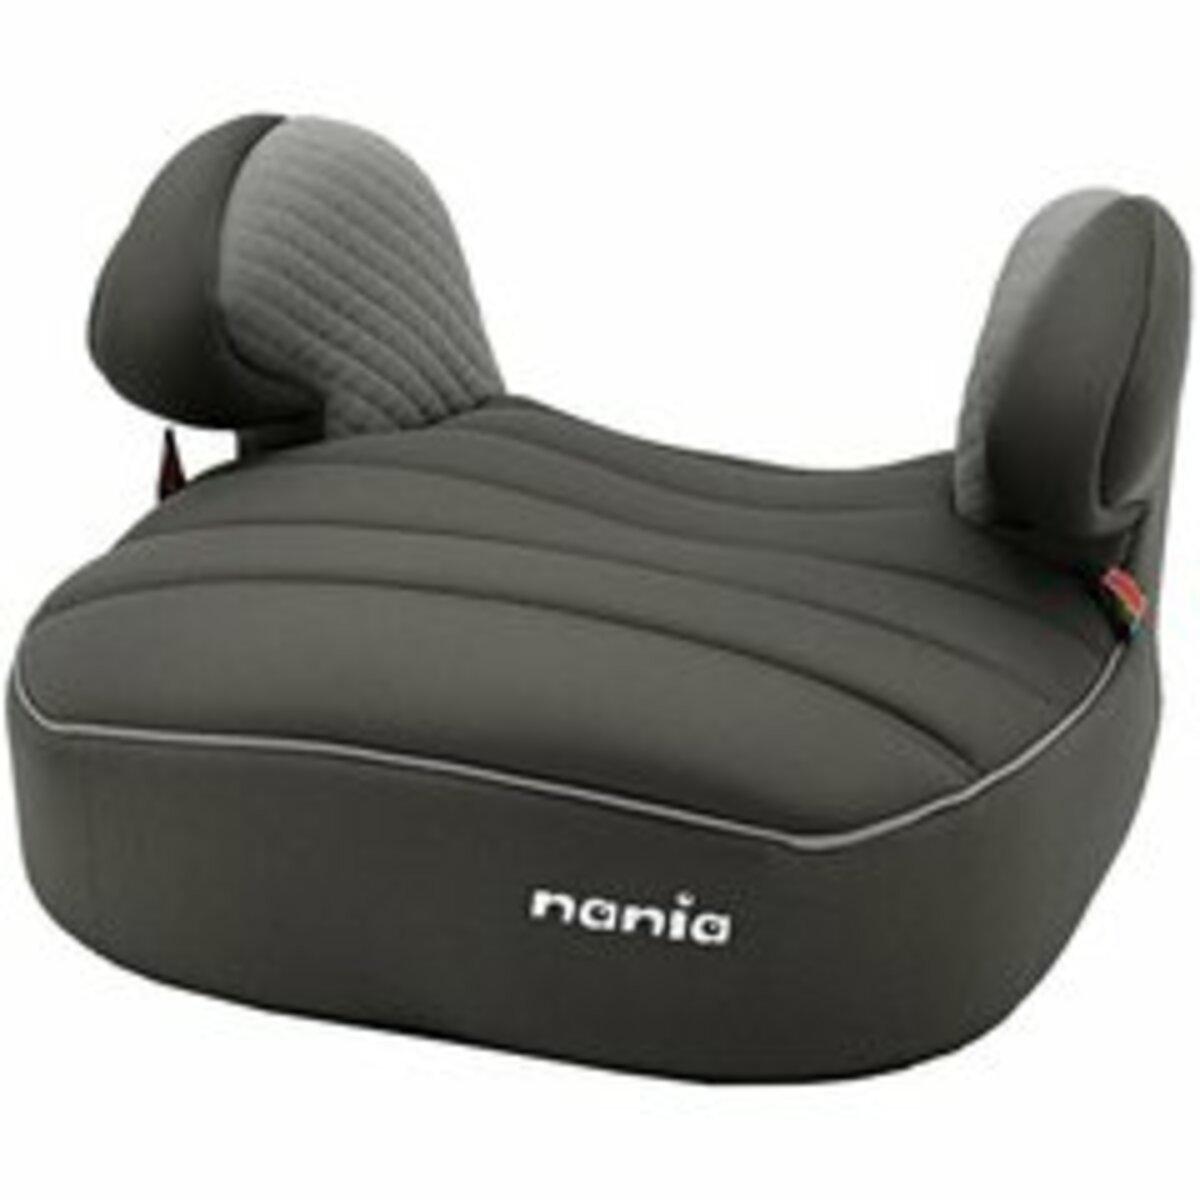 Bild 2 von Nania - Sitzerhöhung Montana Quilt Shadow, Grau